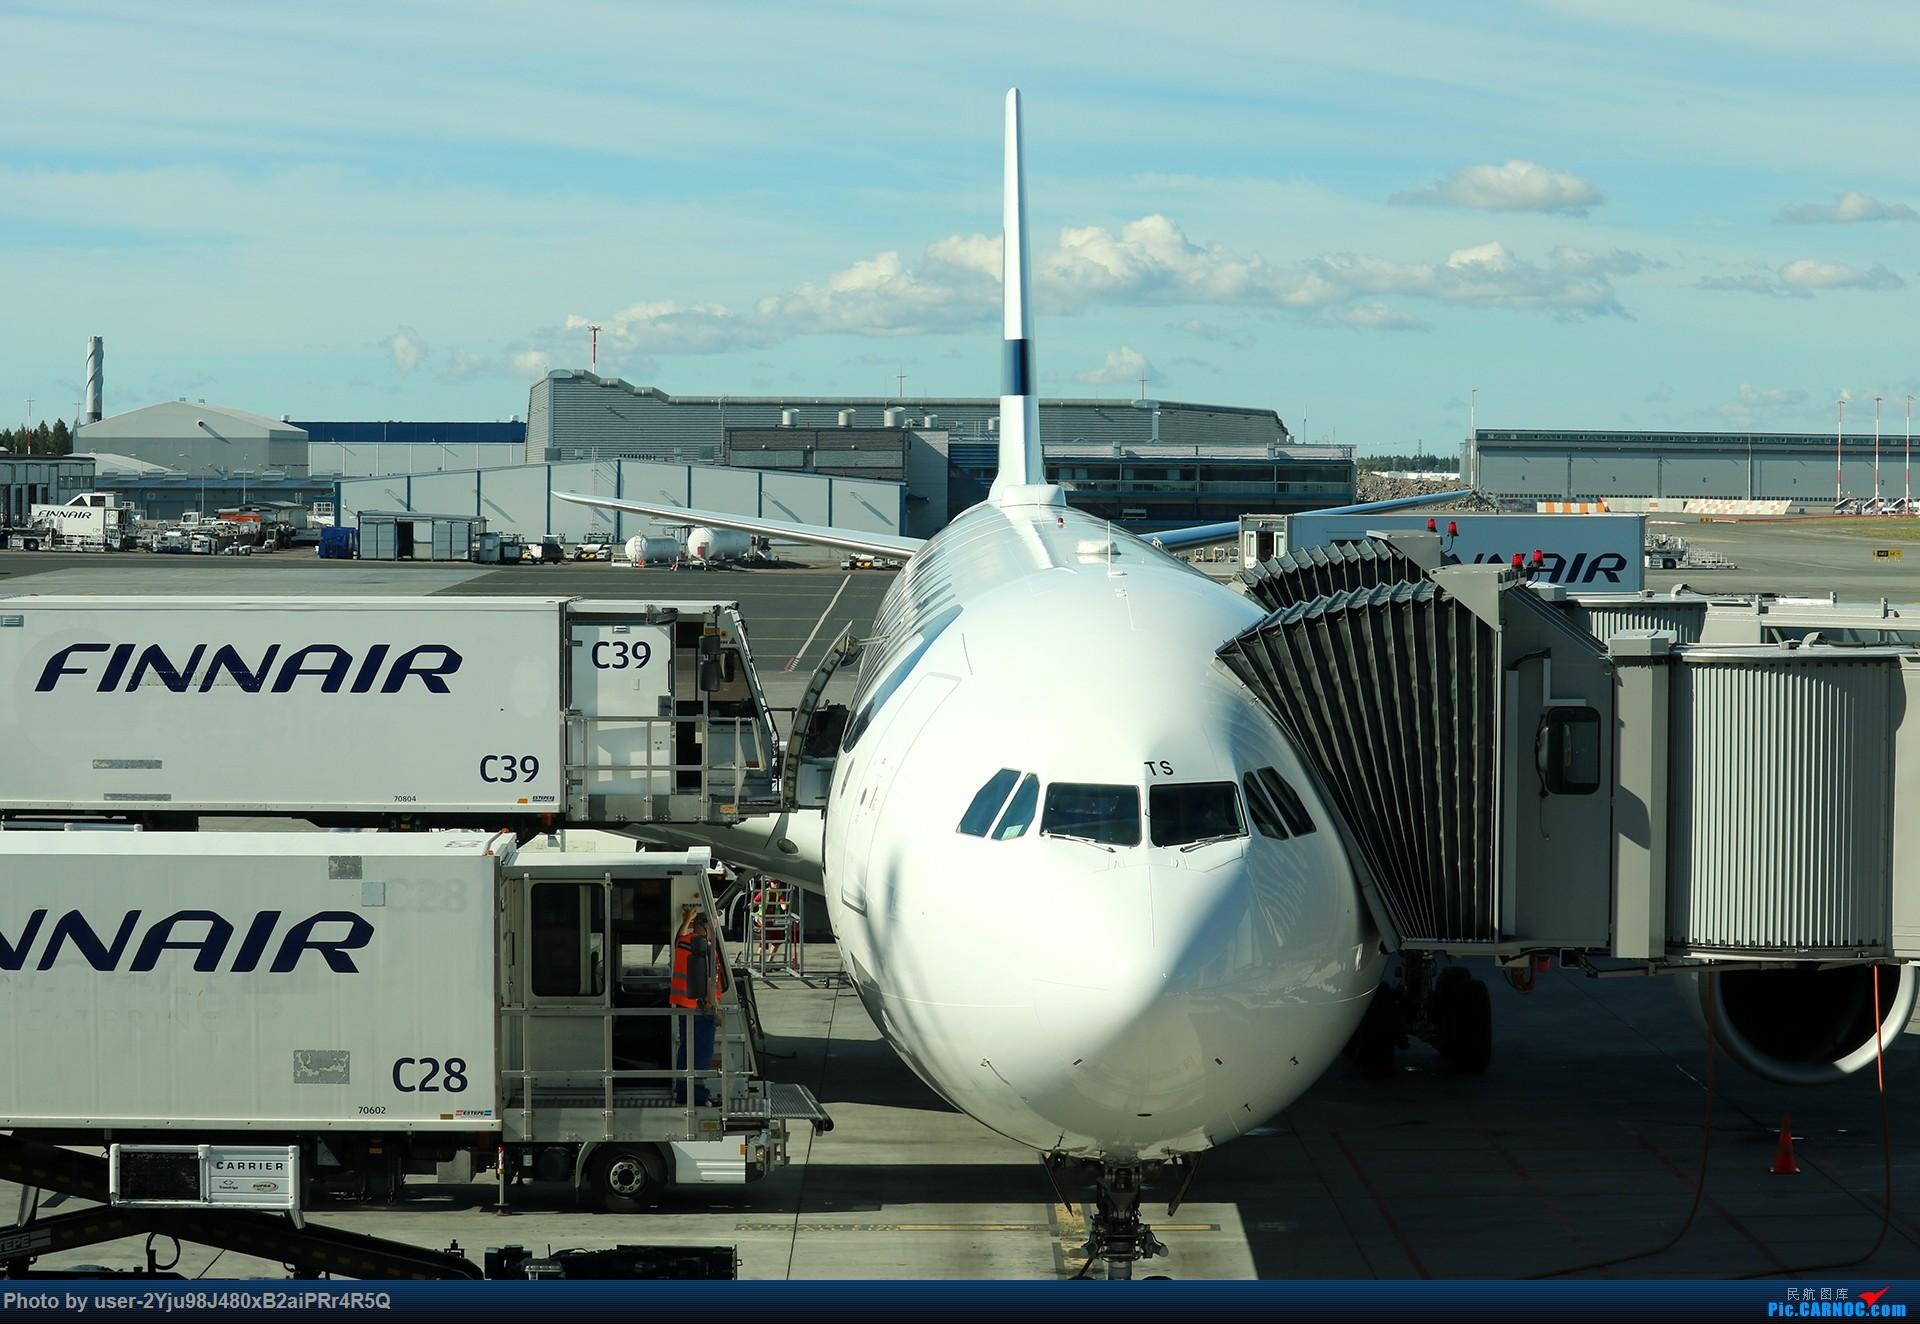 Re:[原创]LIULIU|一天两种机型三个国家四段航线五座城市的回家之路|西伯利亚上空的星光 AIRBUS A330-343 OH-LTS 芬兰赫尔辛基-万塔机场